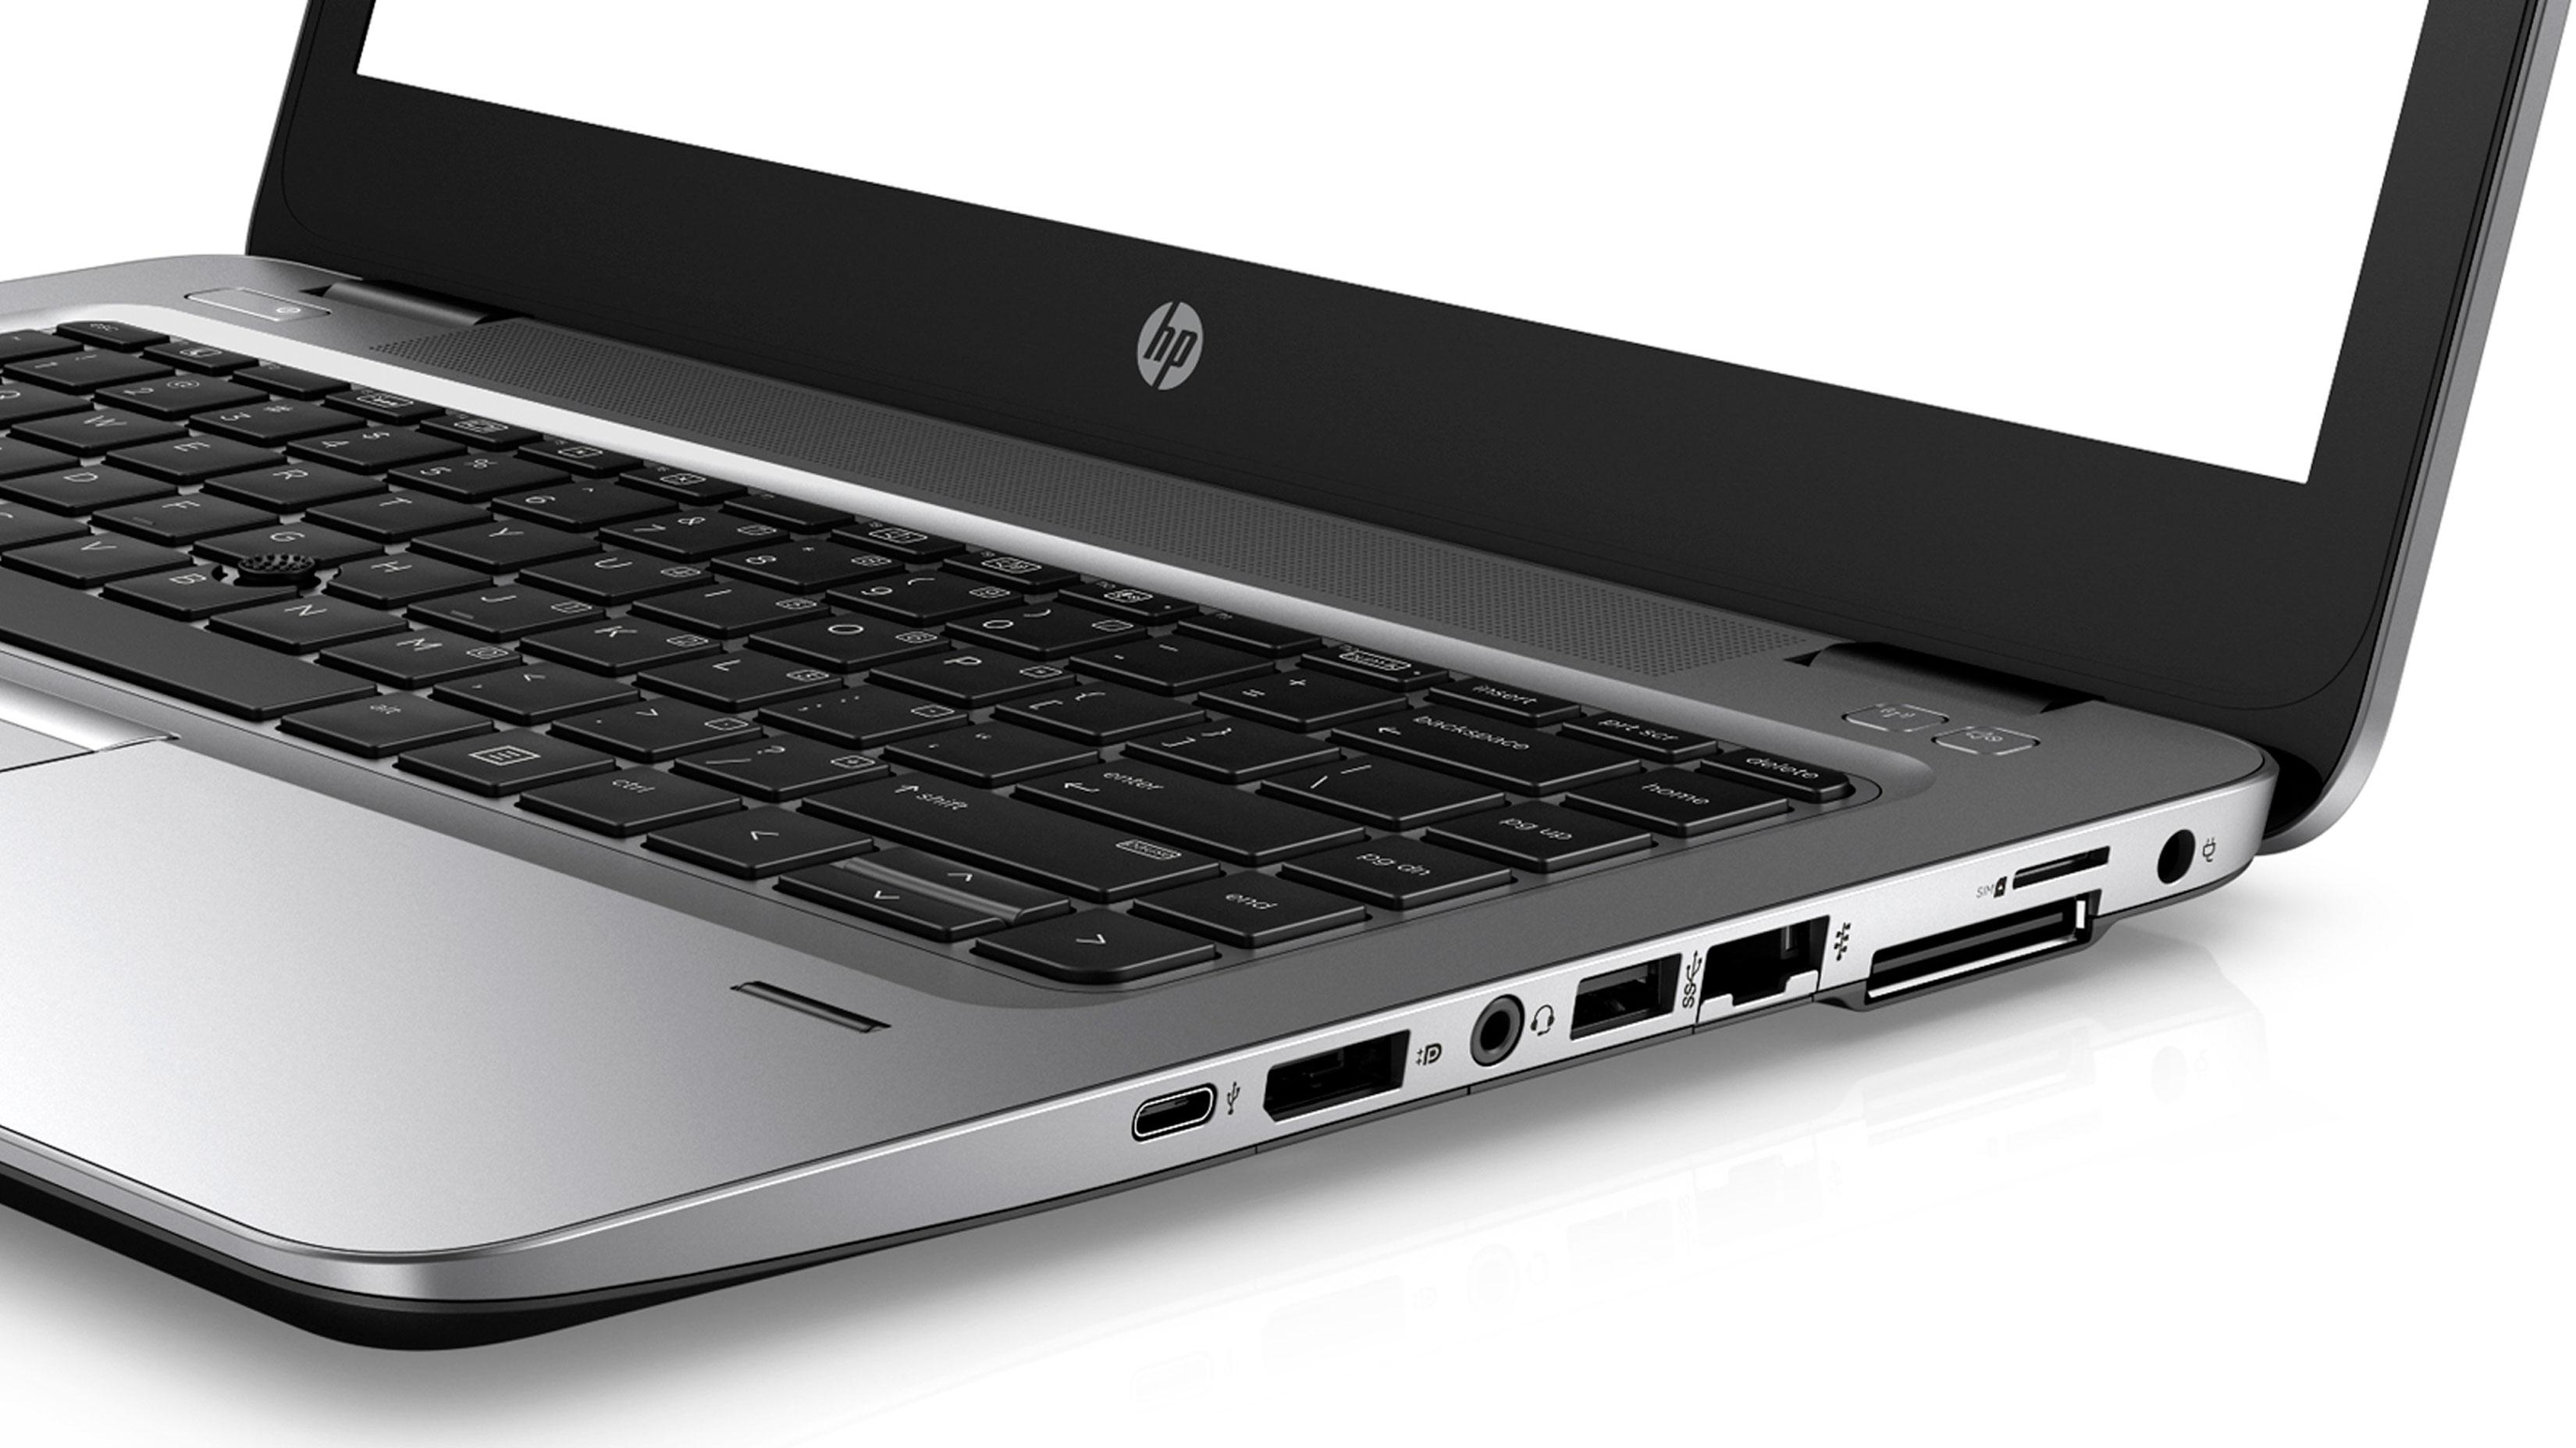 HP EliteBook 840 G3 Z2U97ES Laptop silber: Amazon.de